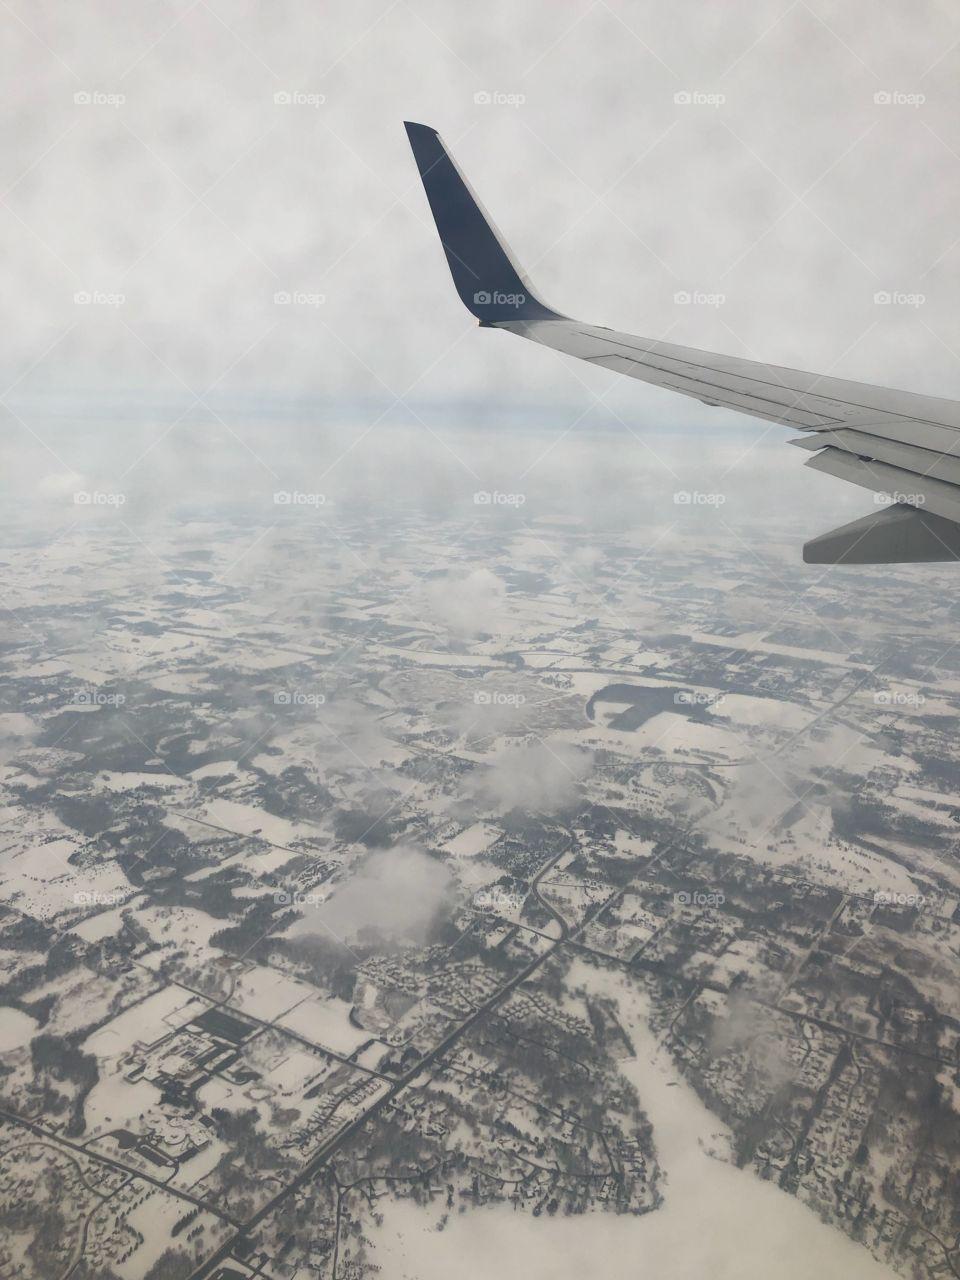 Minnesota looking cold